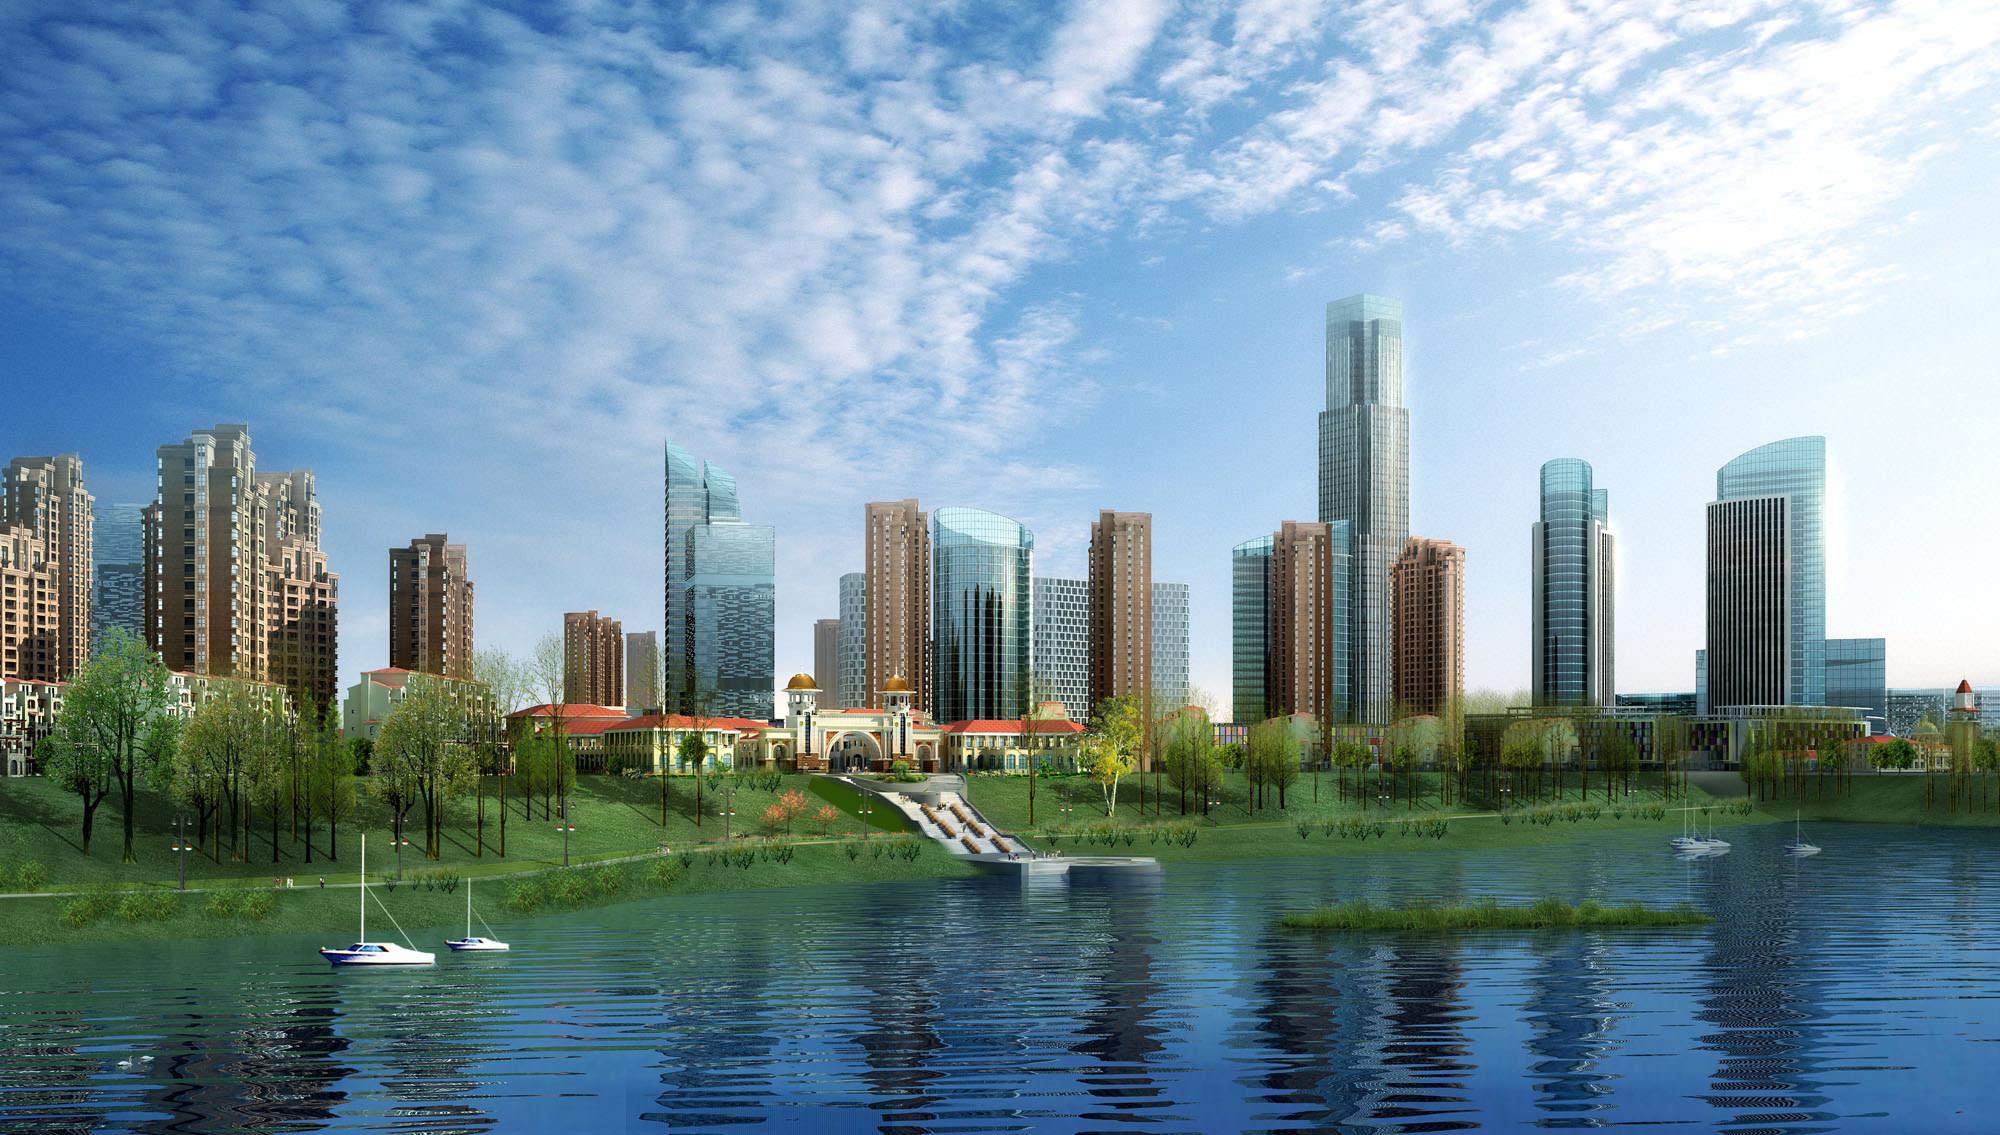 Waterfront City Skyline 513 3d Models 3d Model Max